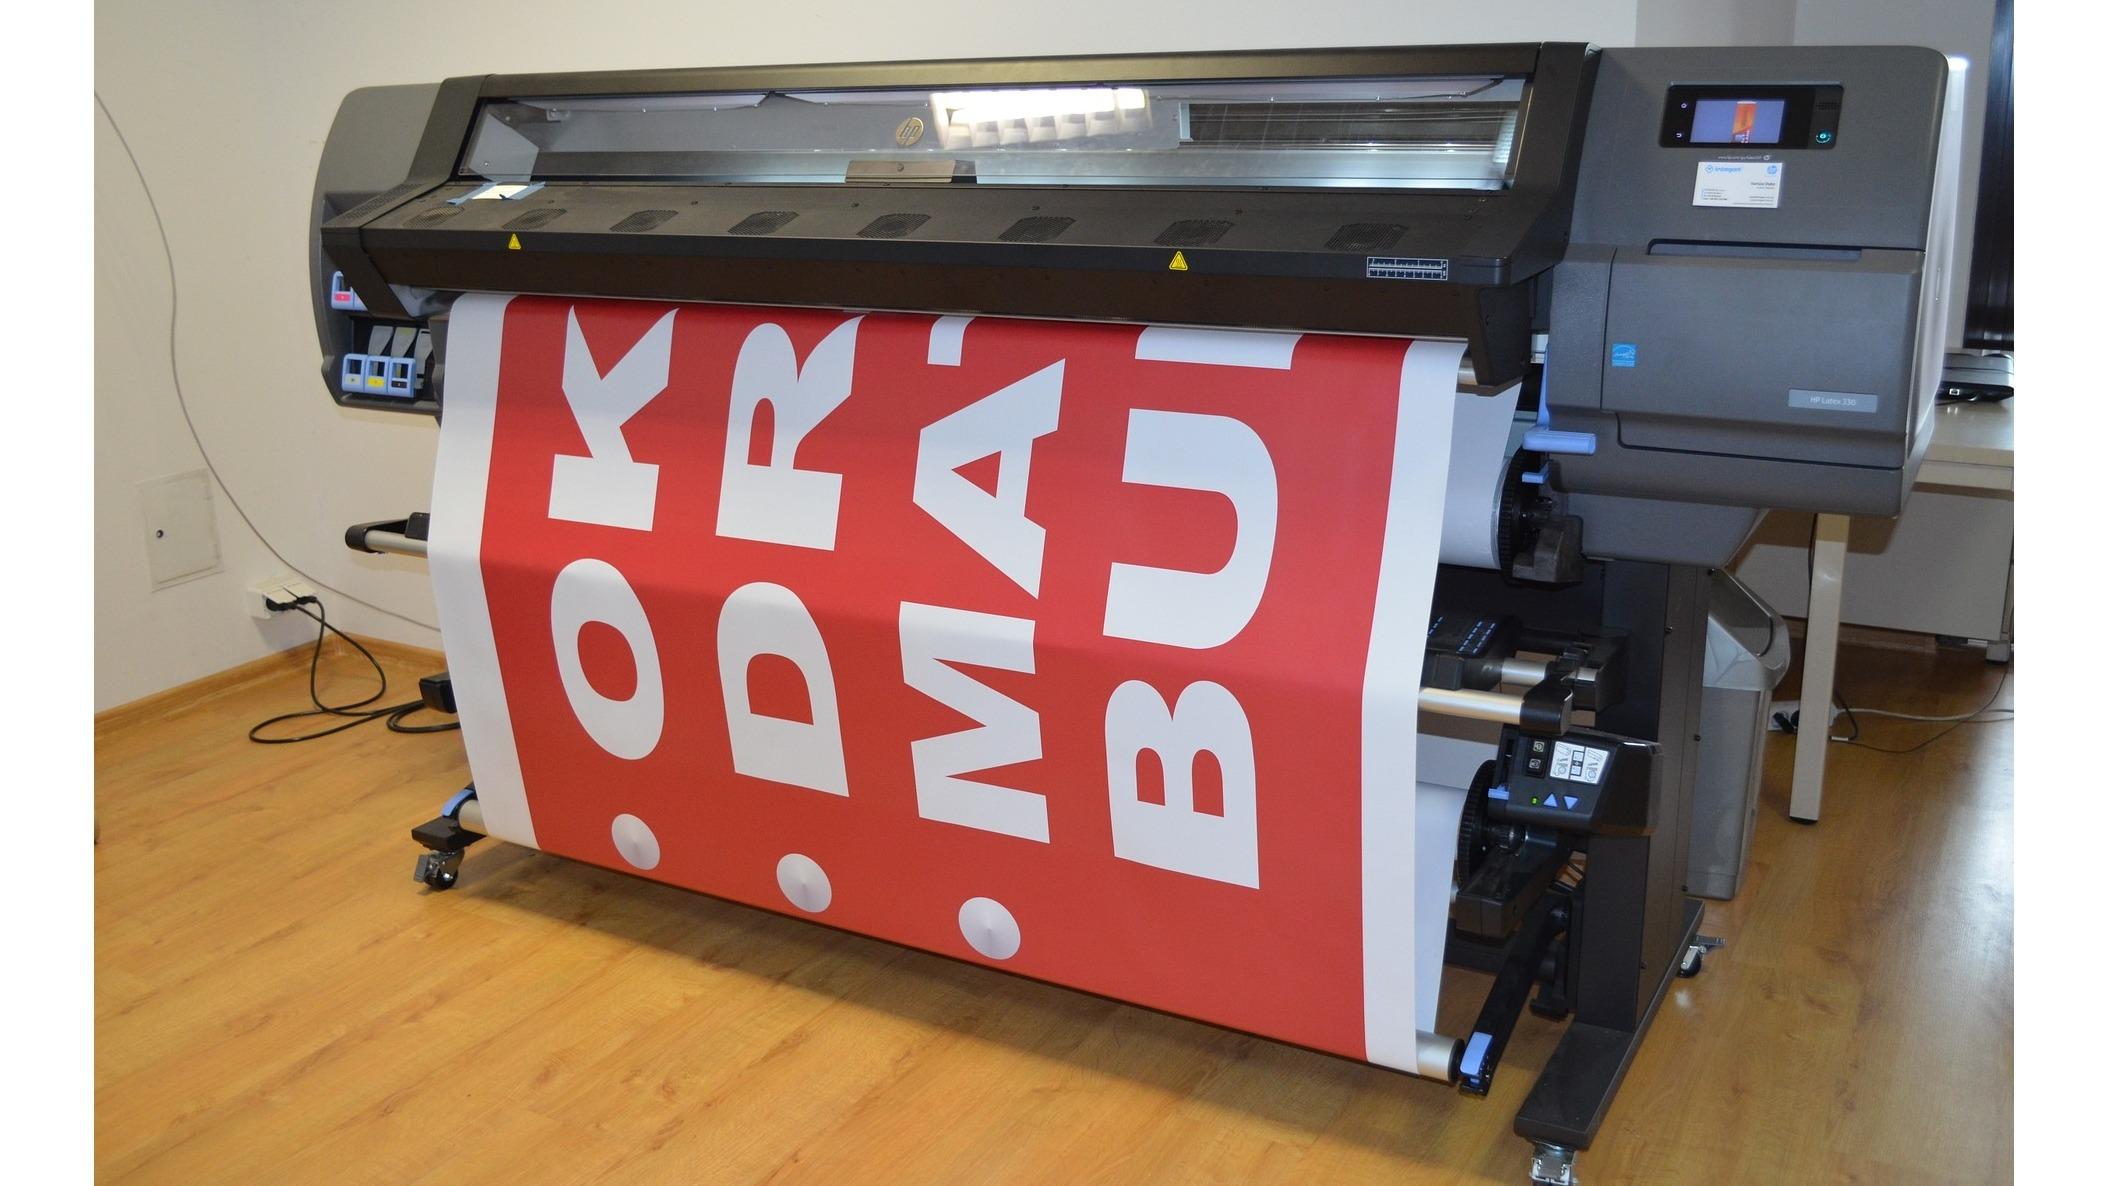 For Print Imprimerie Saint-Joseph